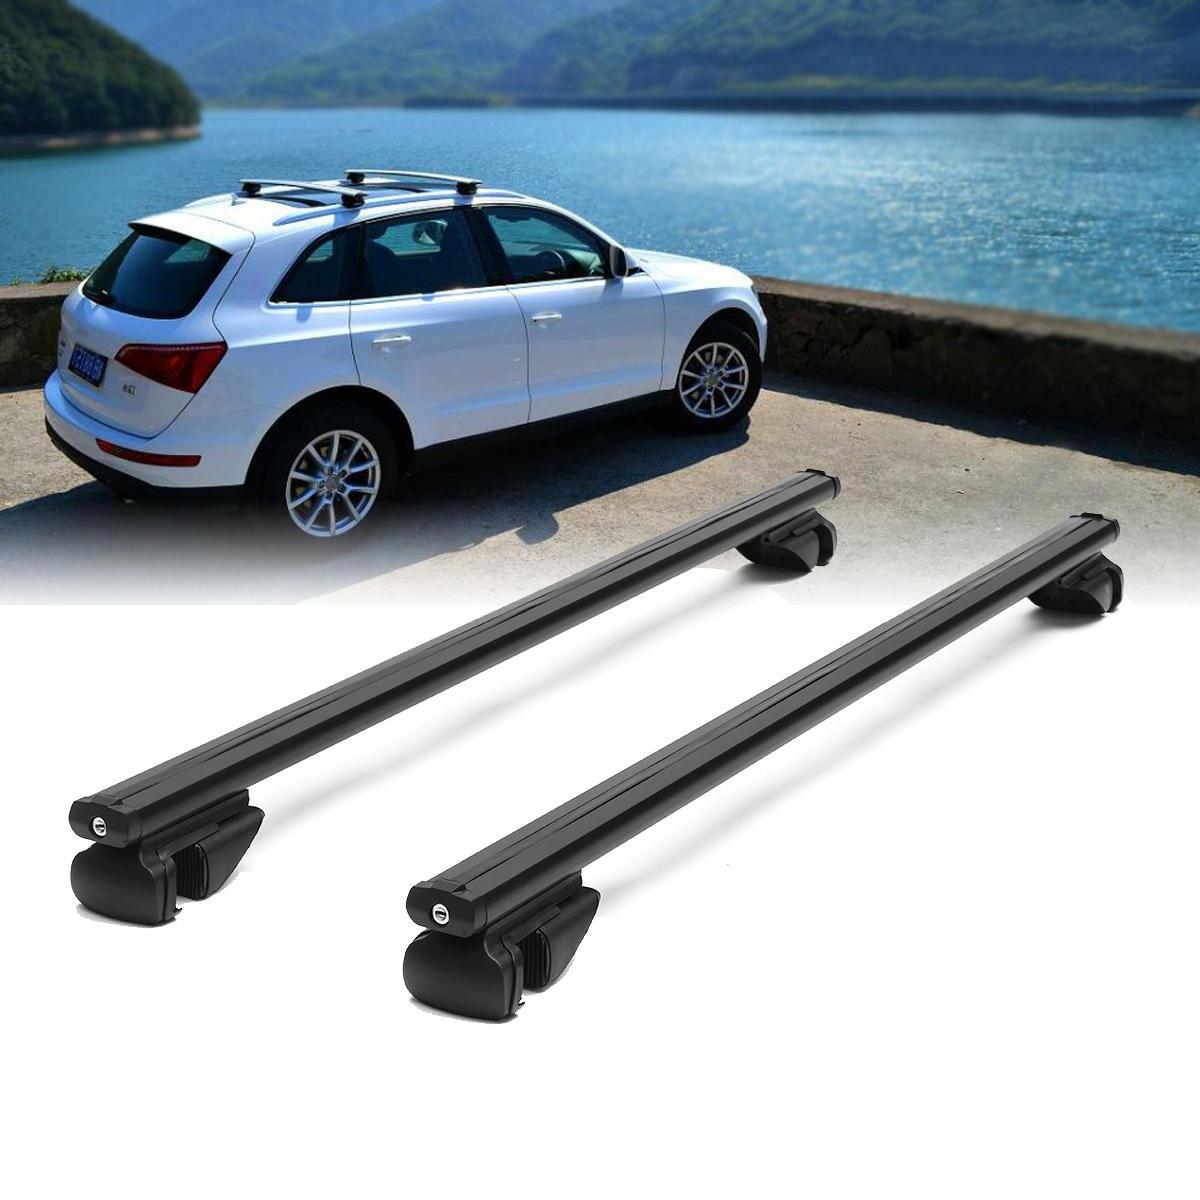 Car Top Roof Racks Universal Cross Bars Lock Anti-theft Lockable Cargo Carrier